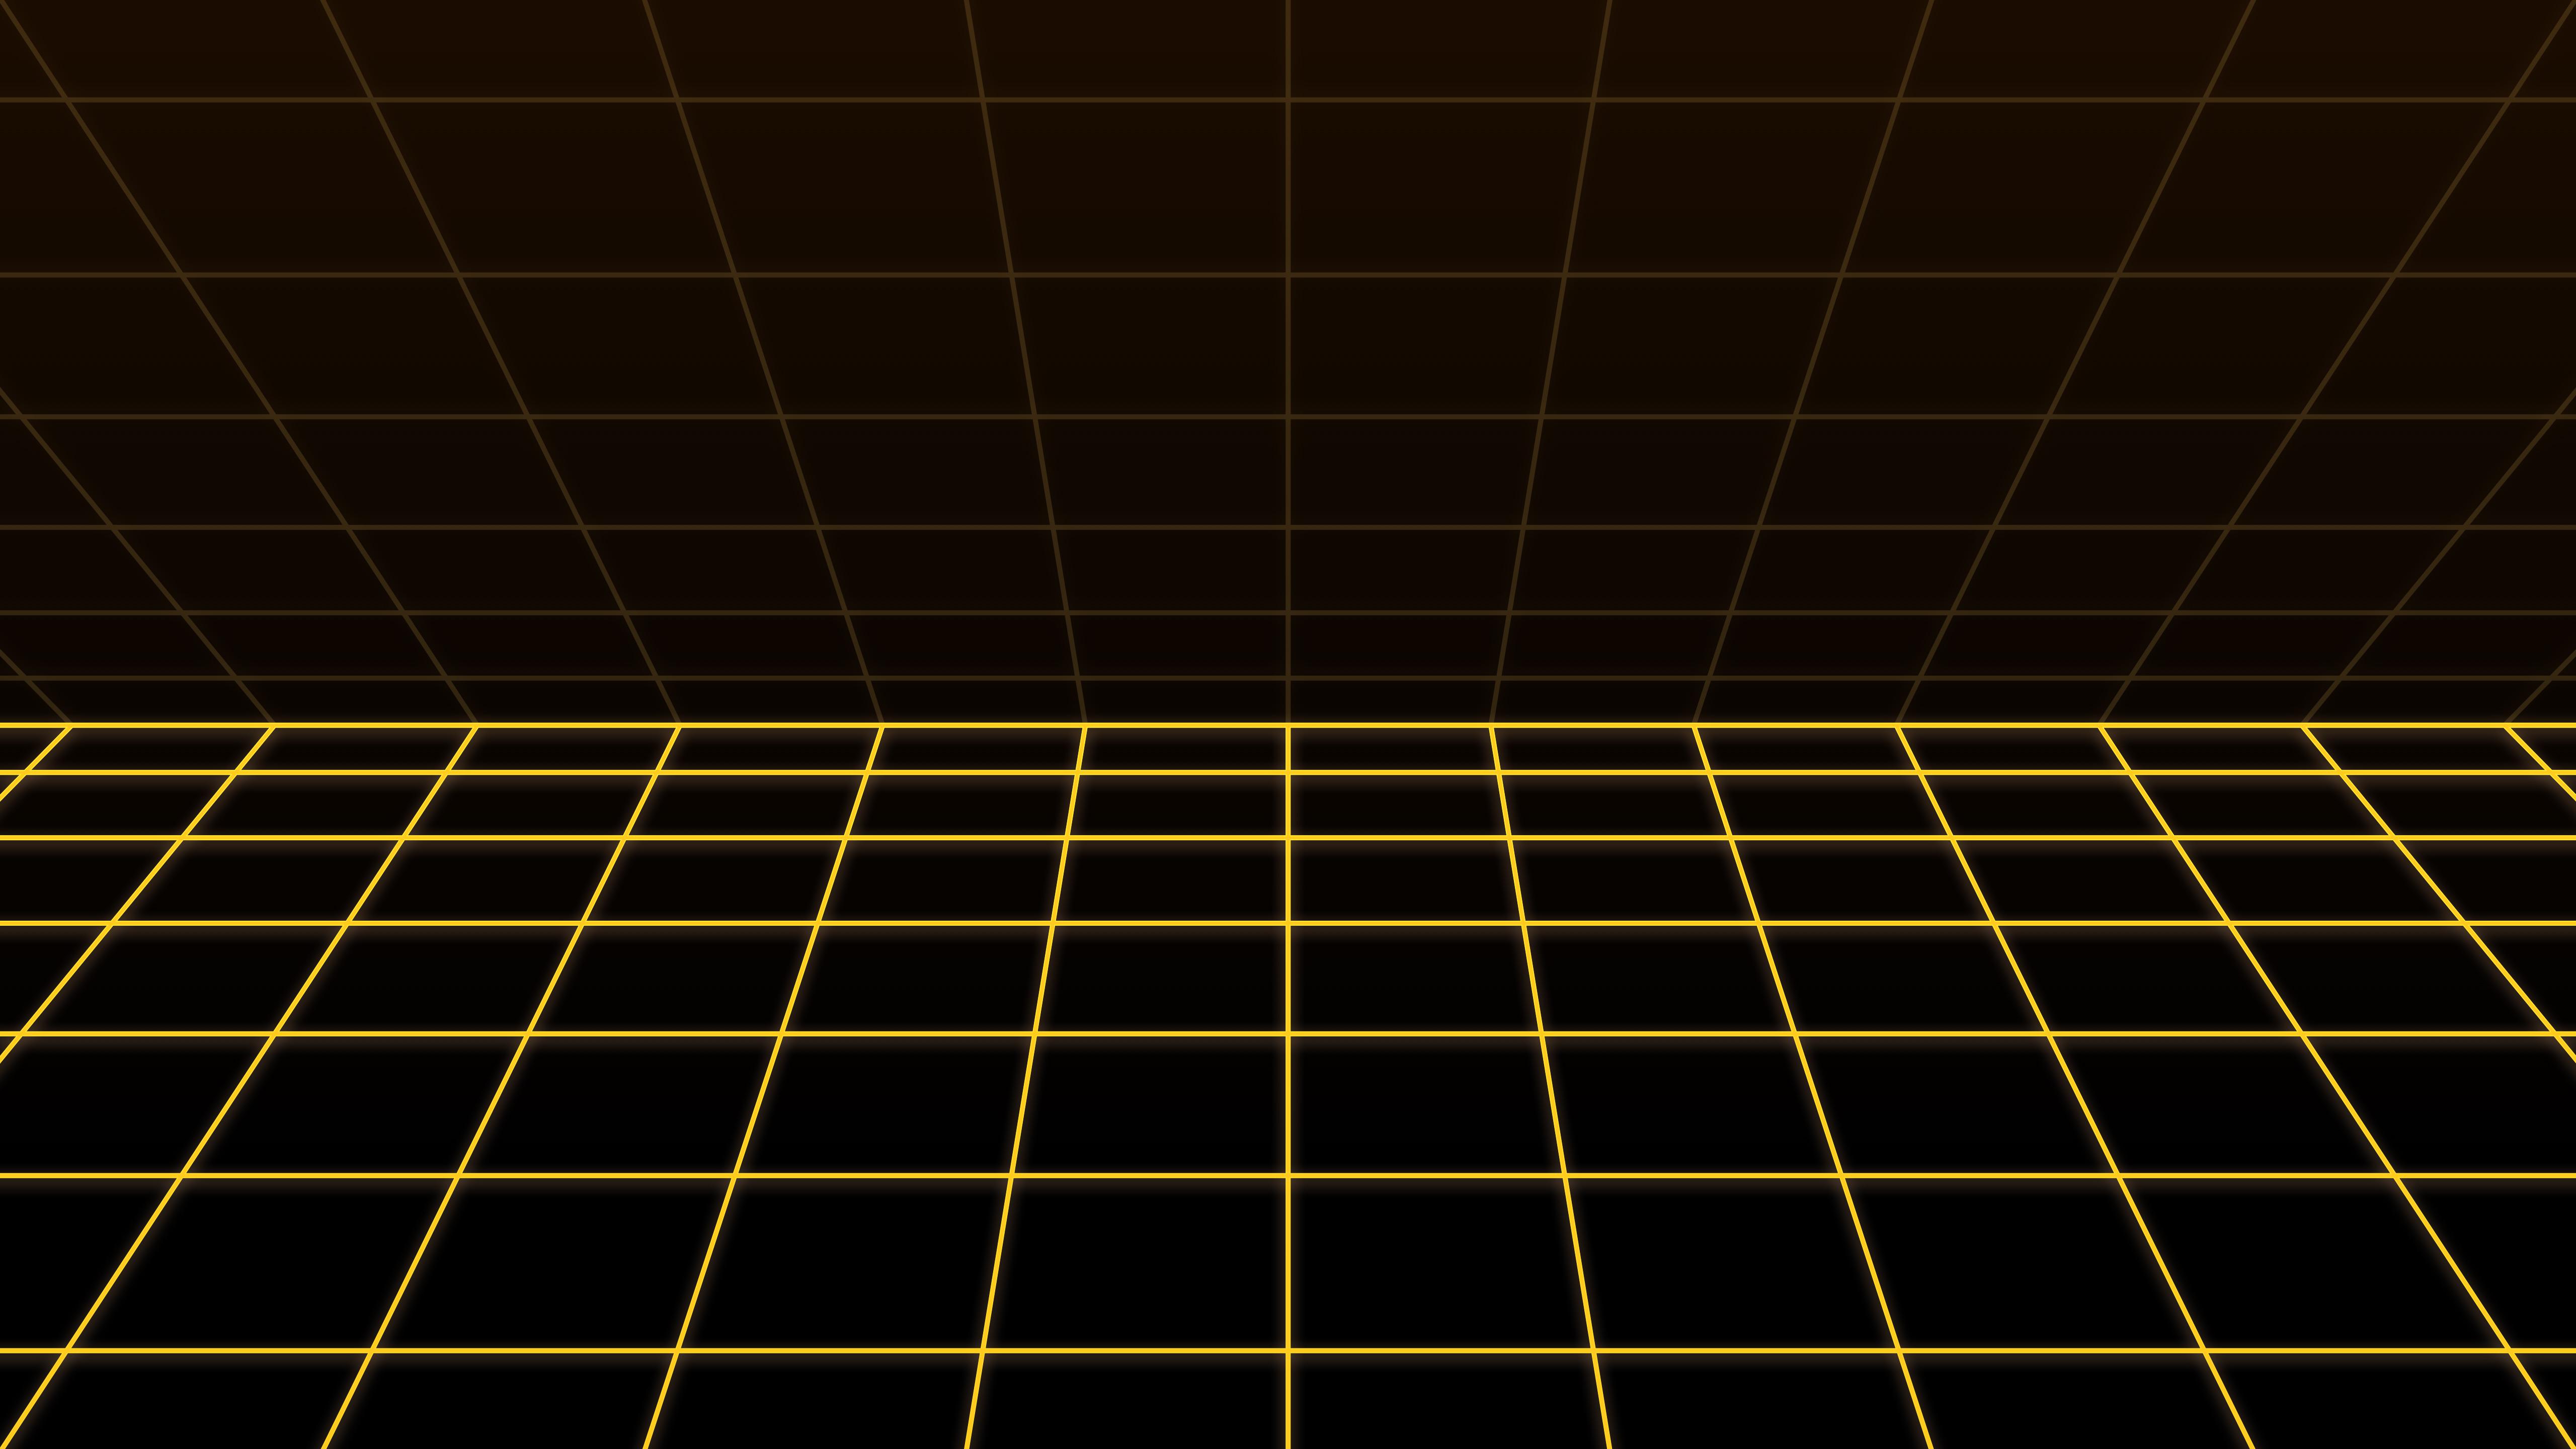 grid yellow 4k 1620164317 - Grid Yellow 4k - Grid Yellow 4k wallpapers